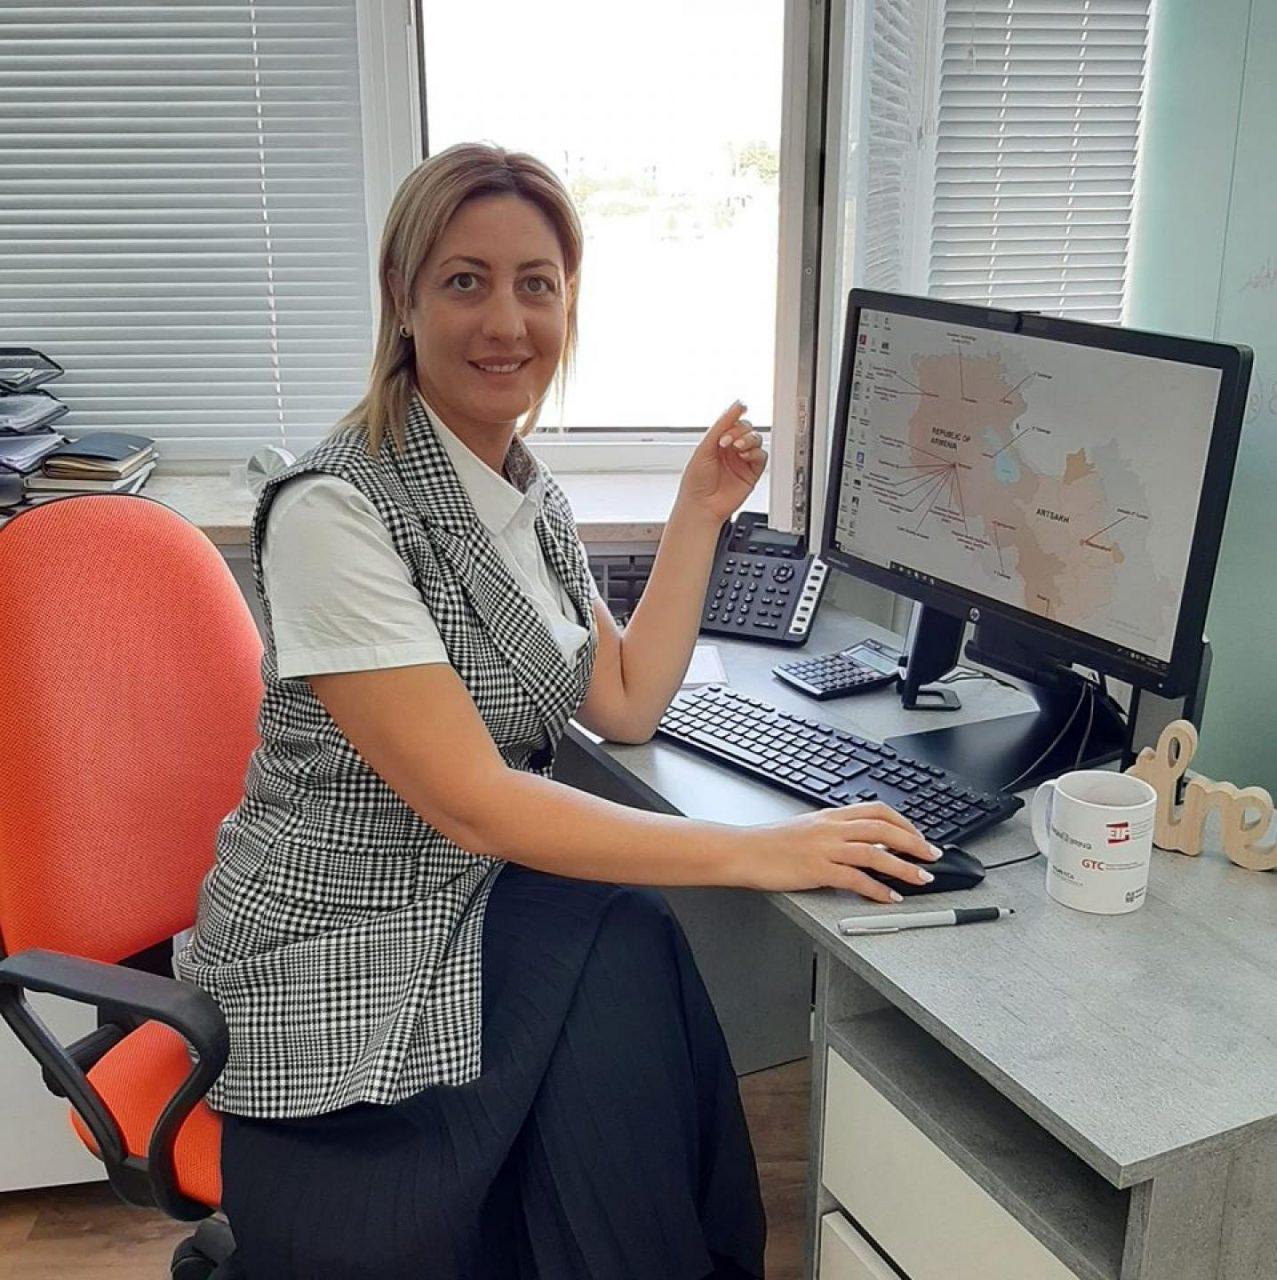 EIF-ի ծրագրերի ղեկավար Ամալյա Եղոյանը «Իմ ռադիոյի» եթերում